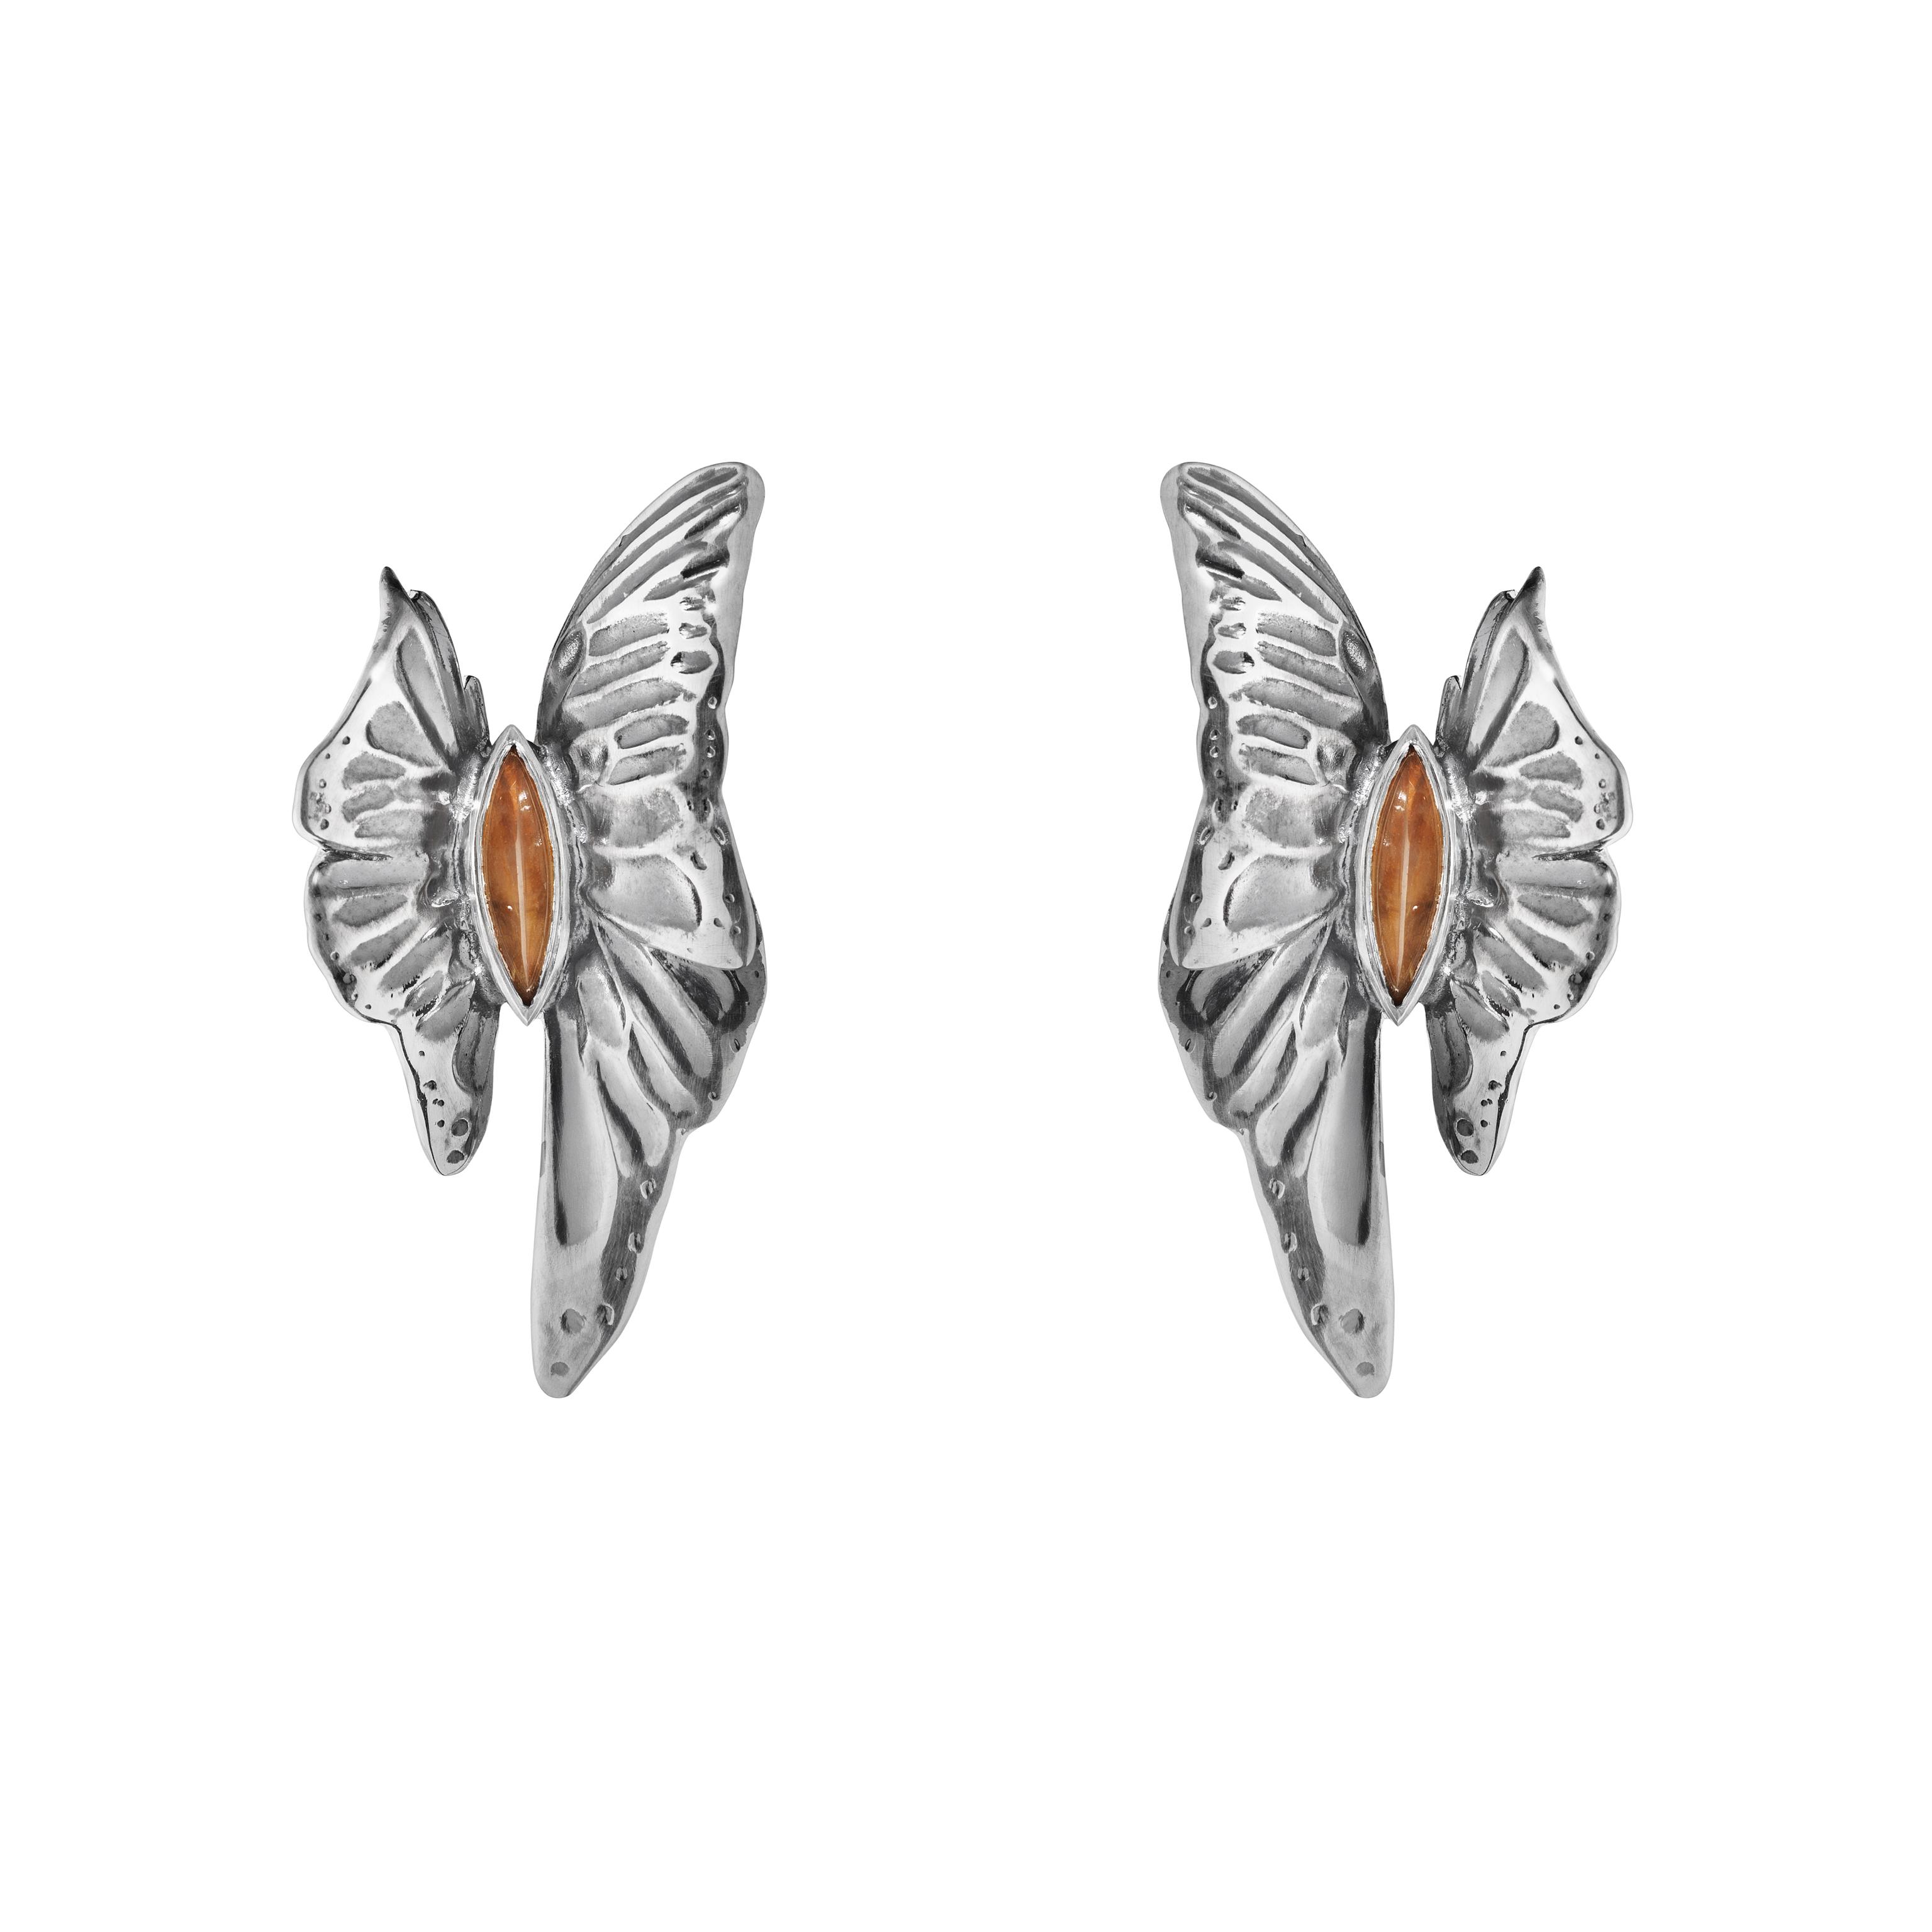 ASKILL 耳環 - 氧化純銀,鑲嵌黃晶建議售價22,400